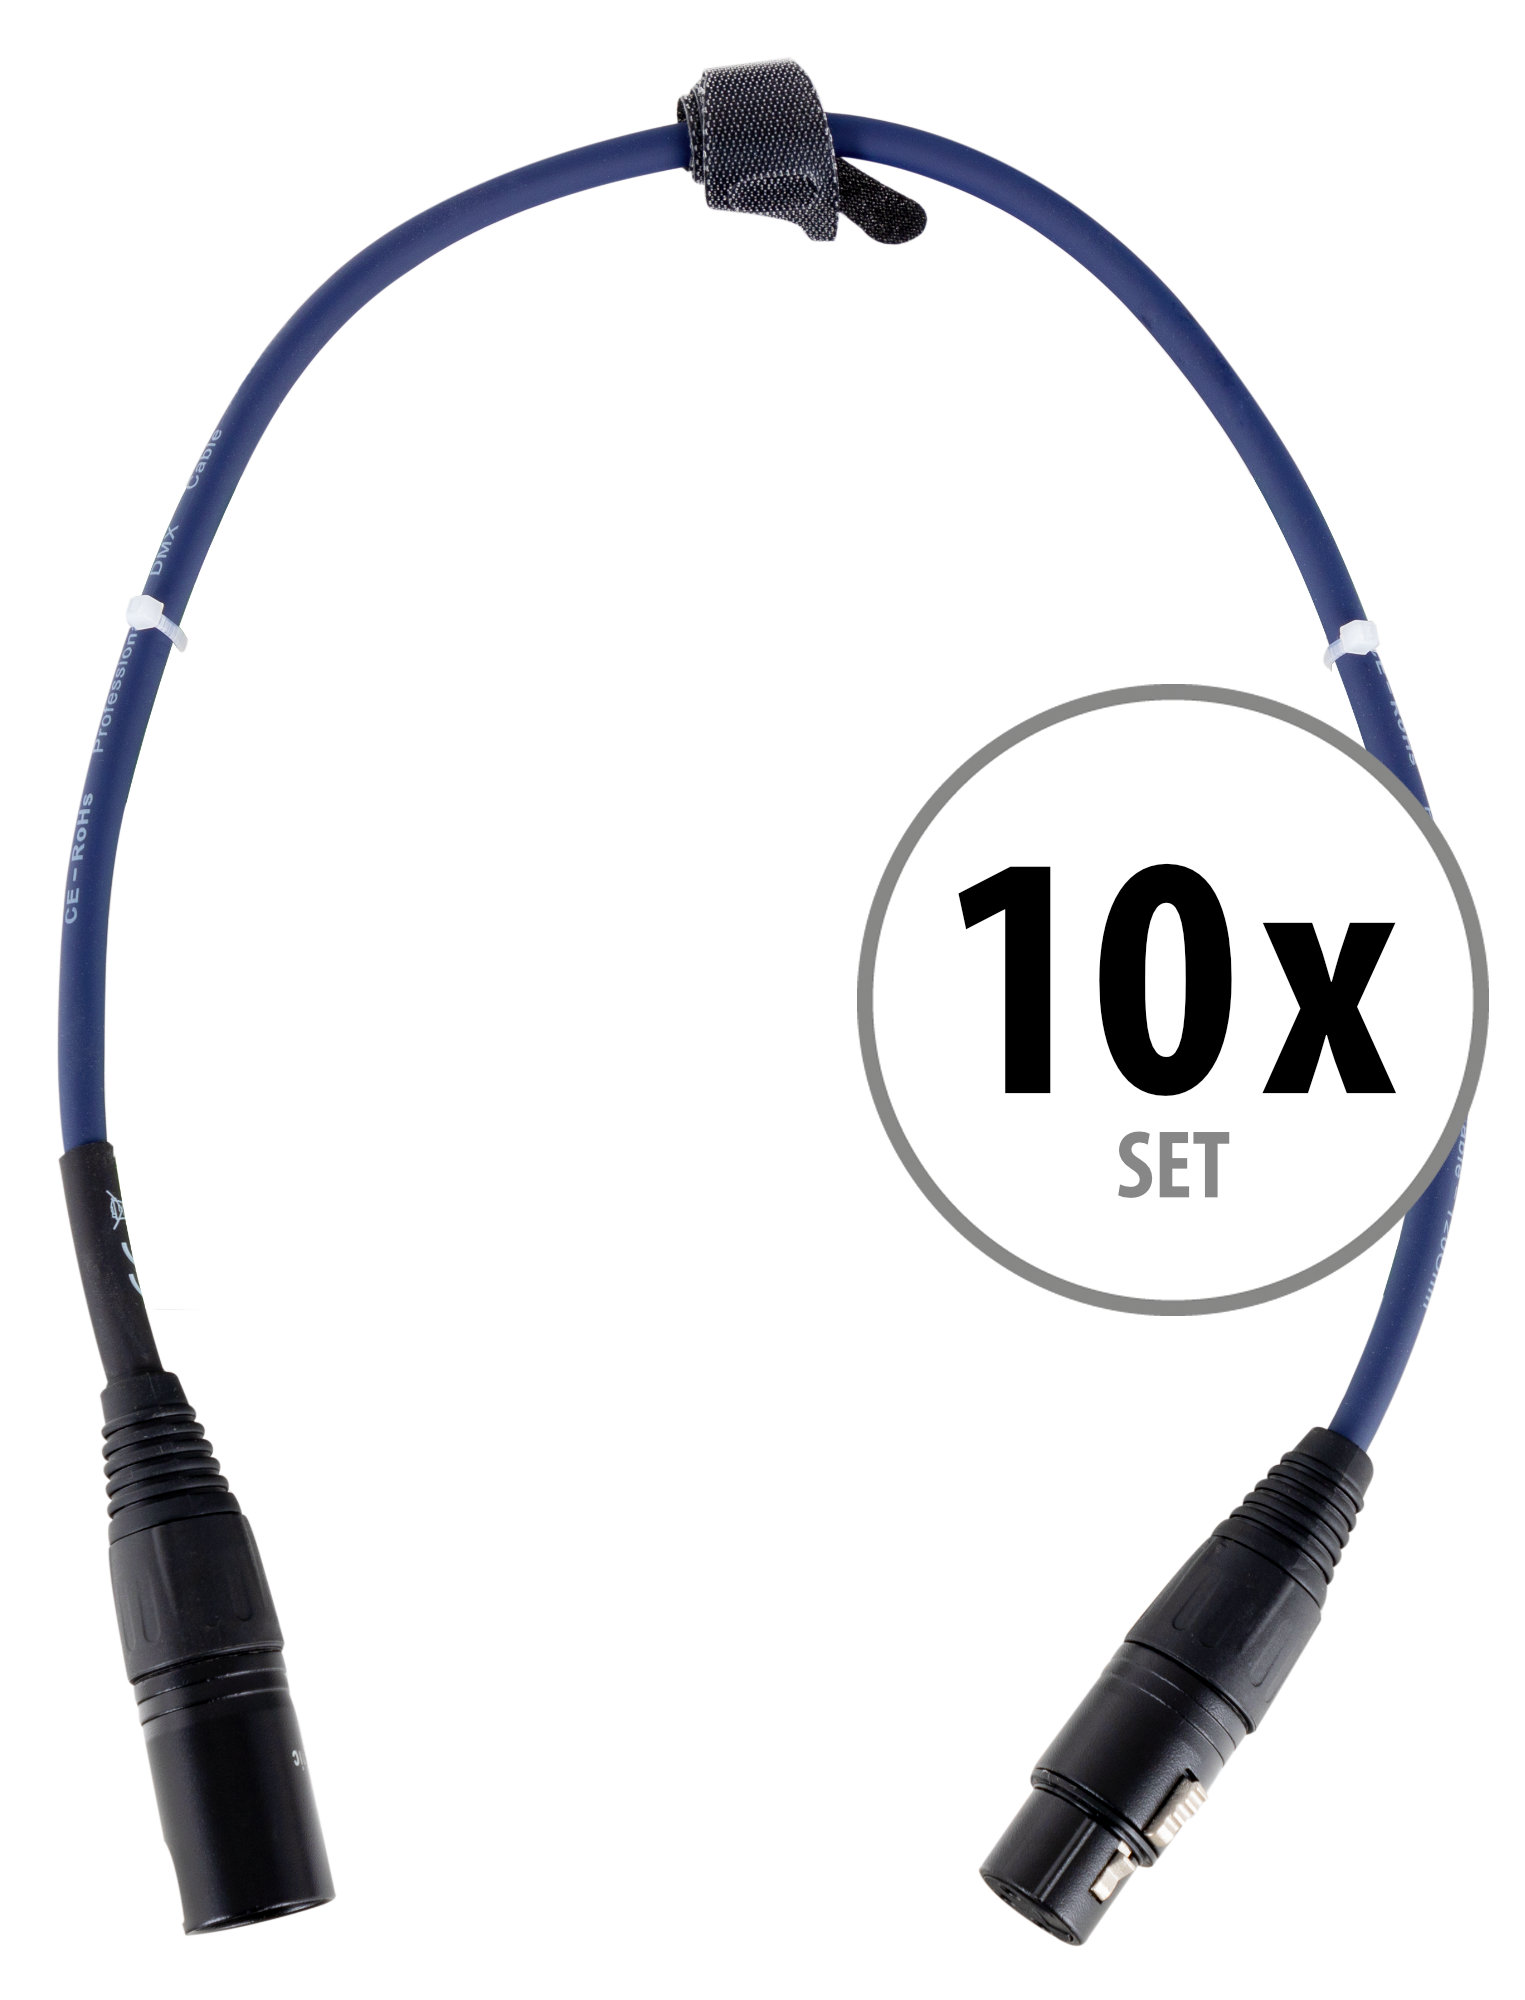 Pronomic Stage DMX3 0,5 DMX Kabel 0,5m 10x Set